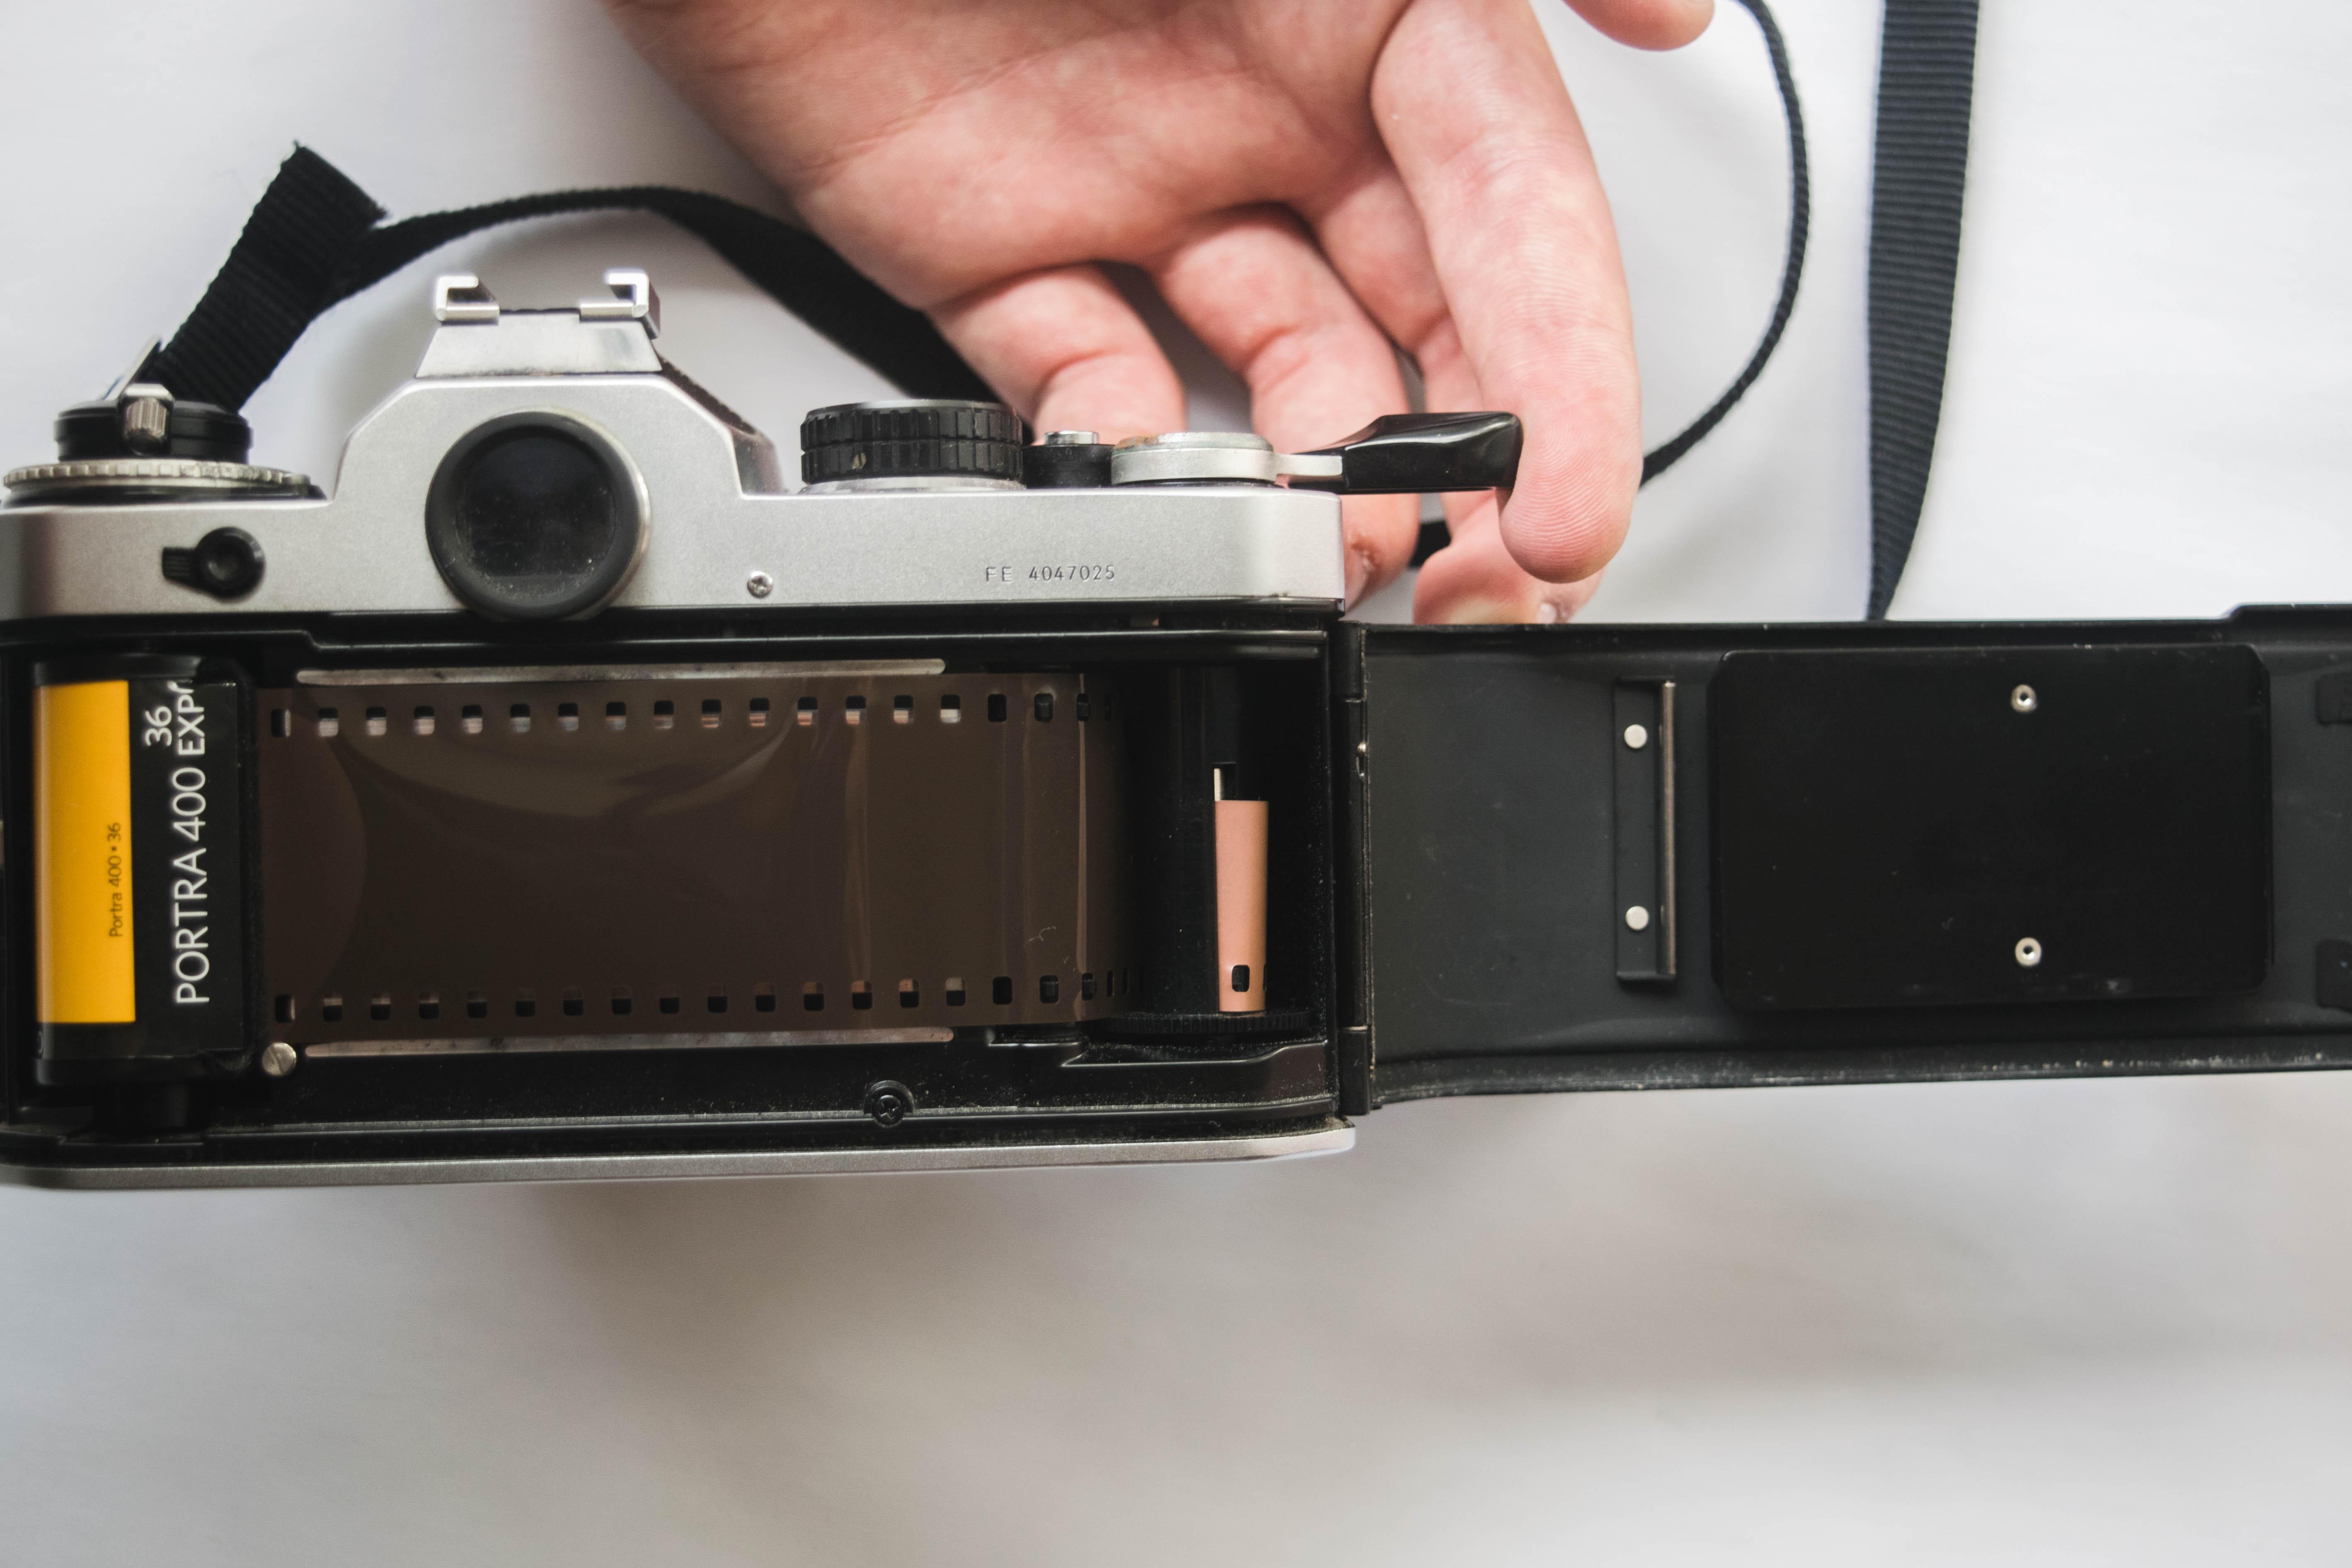 Emulsion Side - How to Load Film into a 35mm Film Camera - FilterGrade Blog